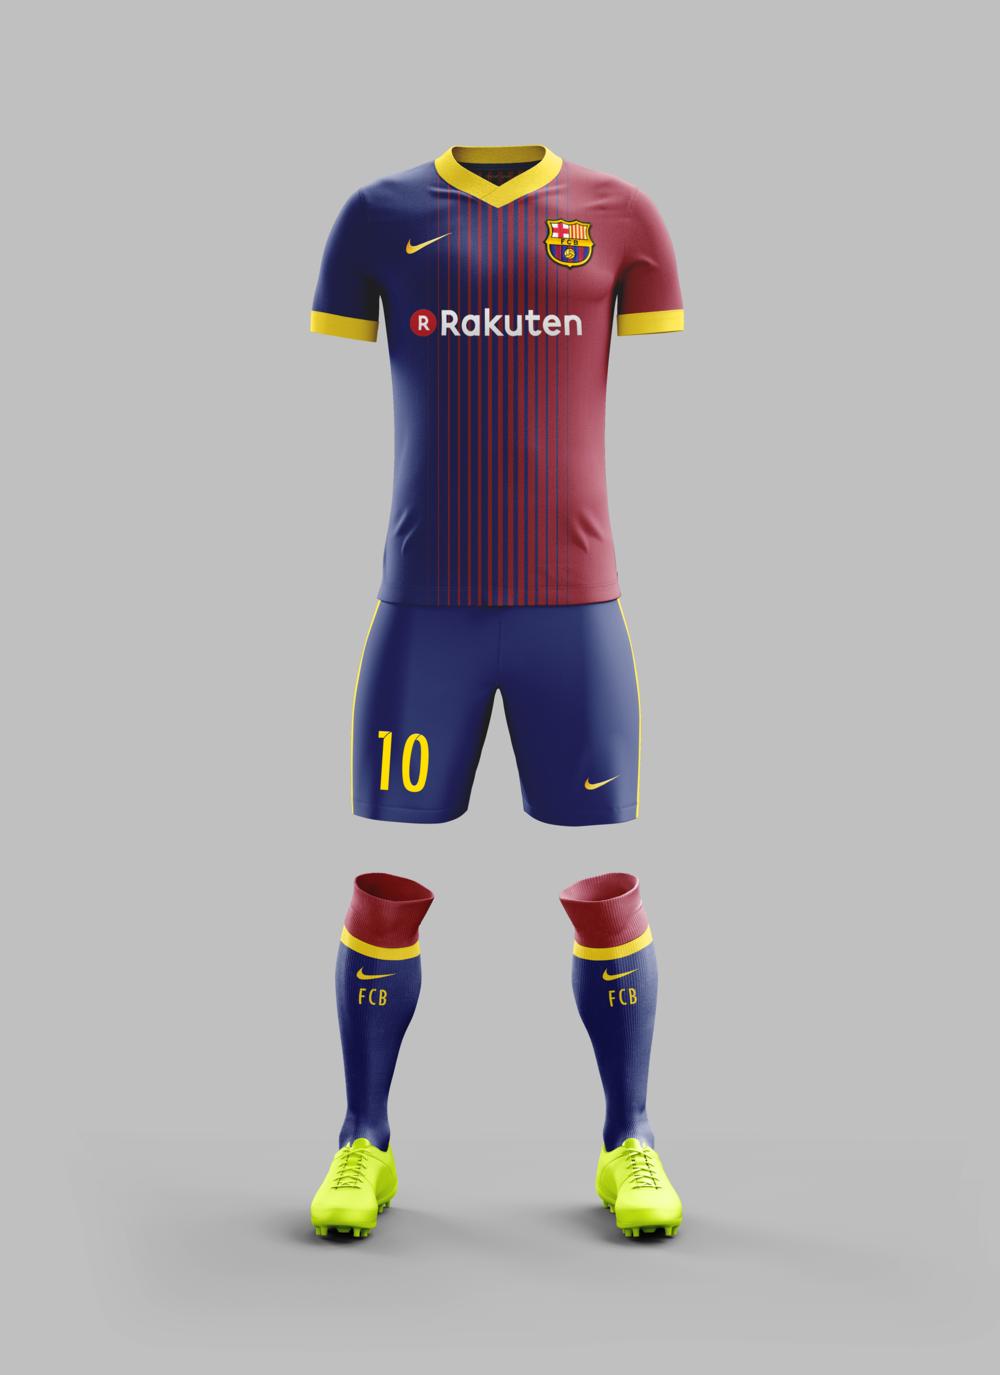 F c barcelona kits mauricio diaz - New home barcelona ...